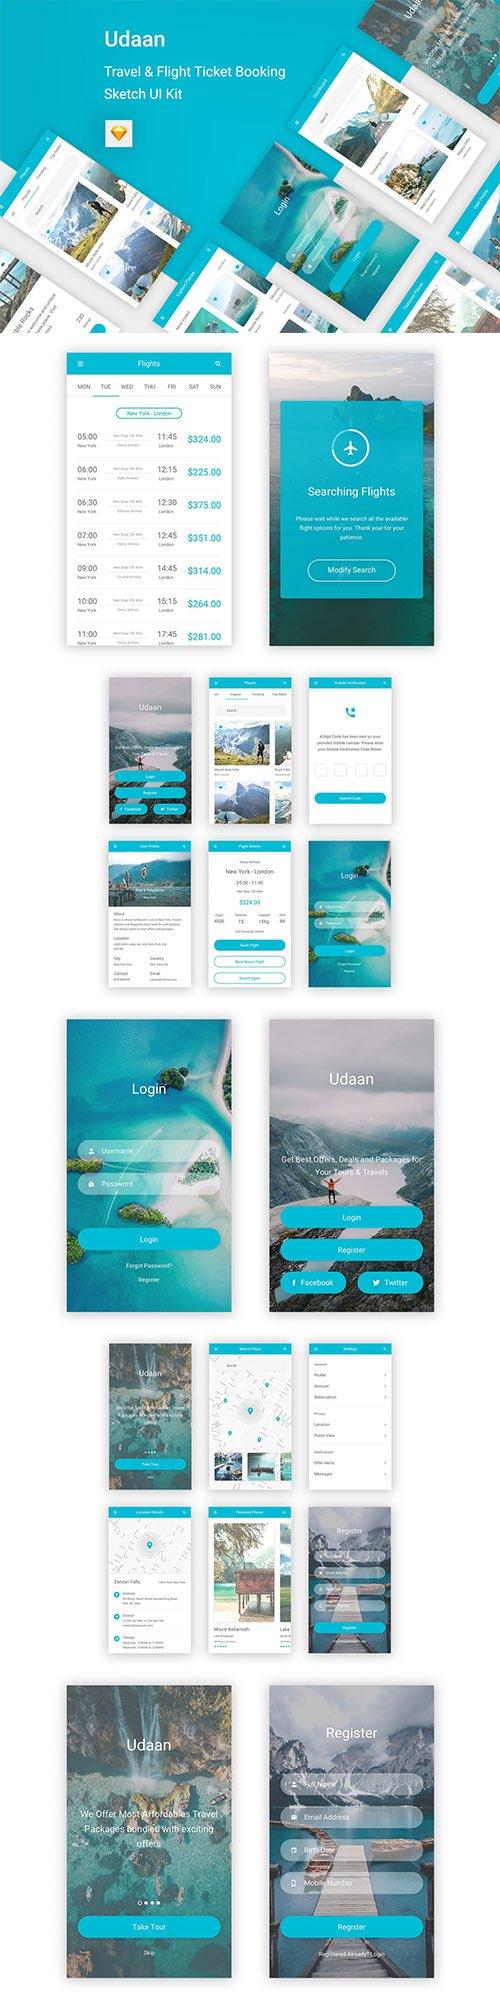 Udaan - Travel & Flight Booking App for Sketch XD